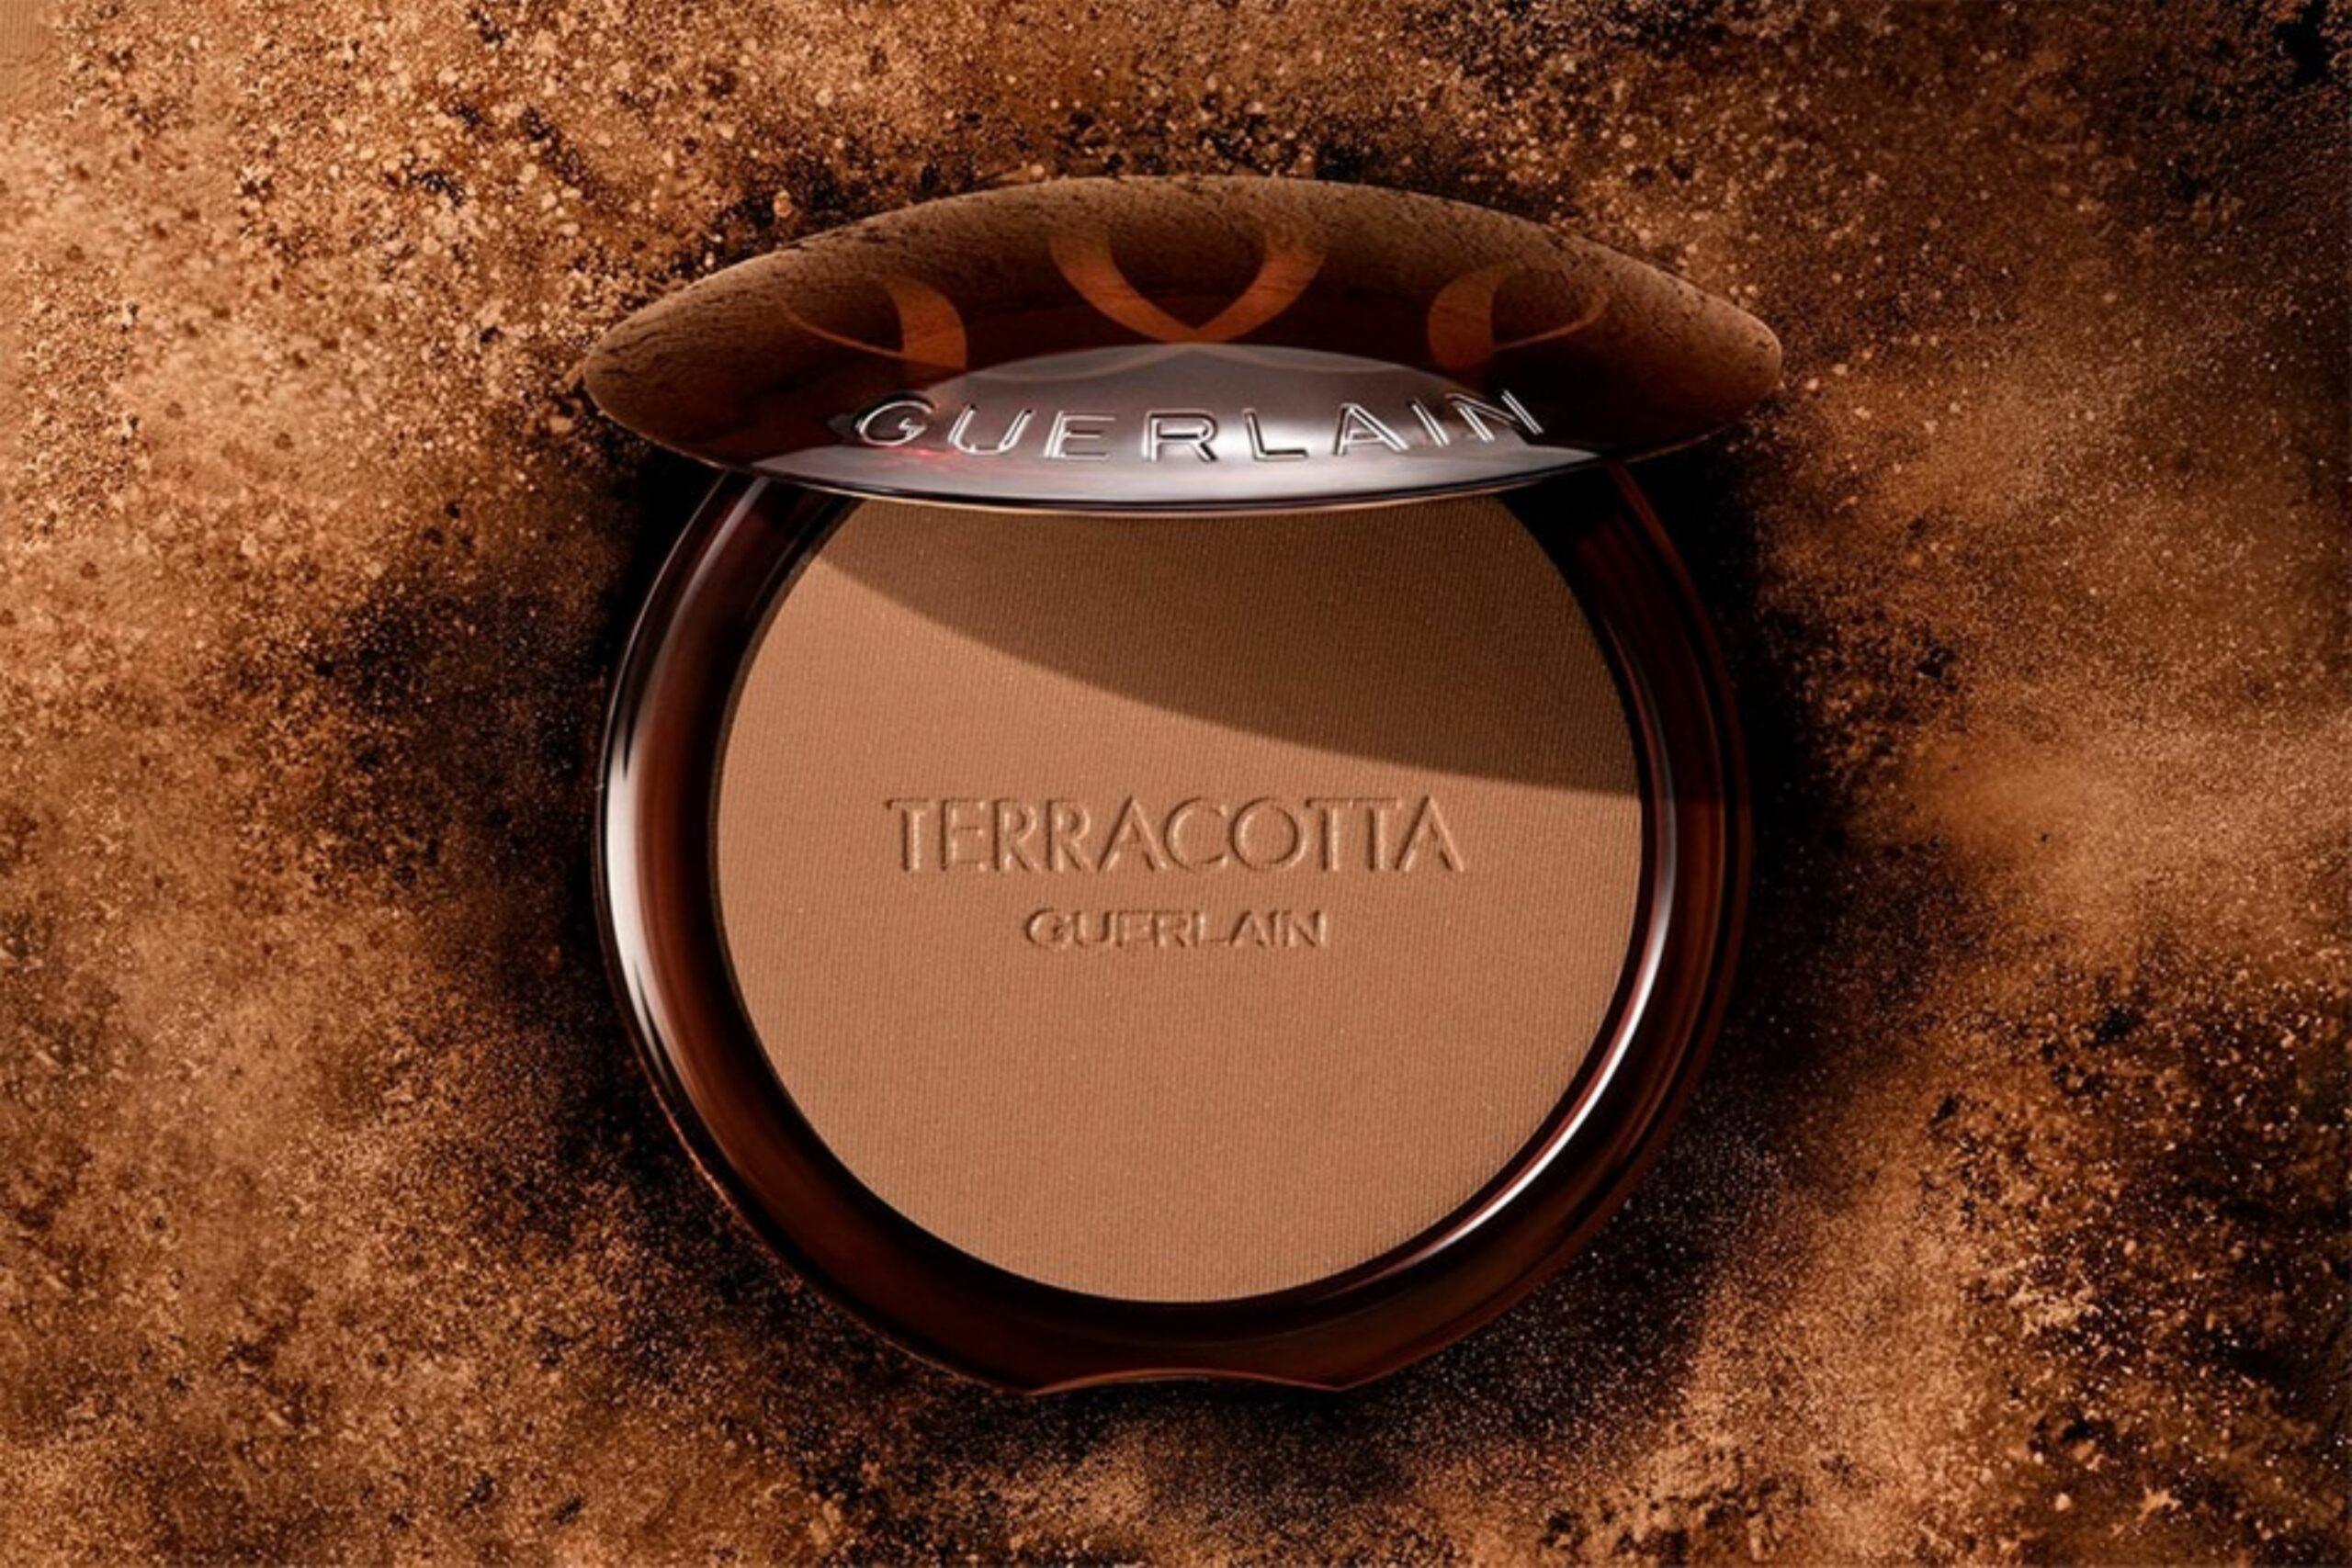 Moroccan argan oil, the star product of Guerlain's new terracotta bronzing powder